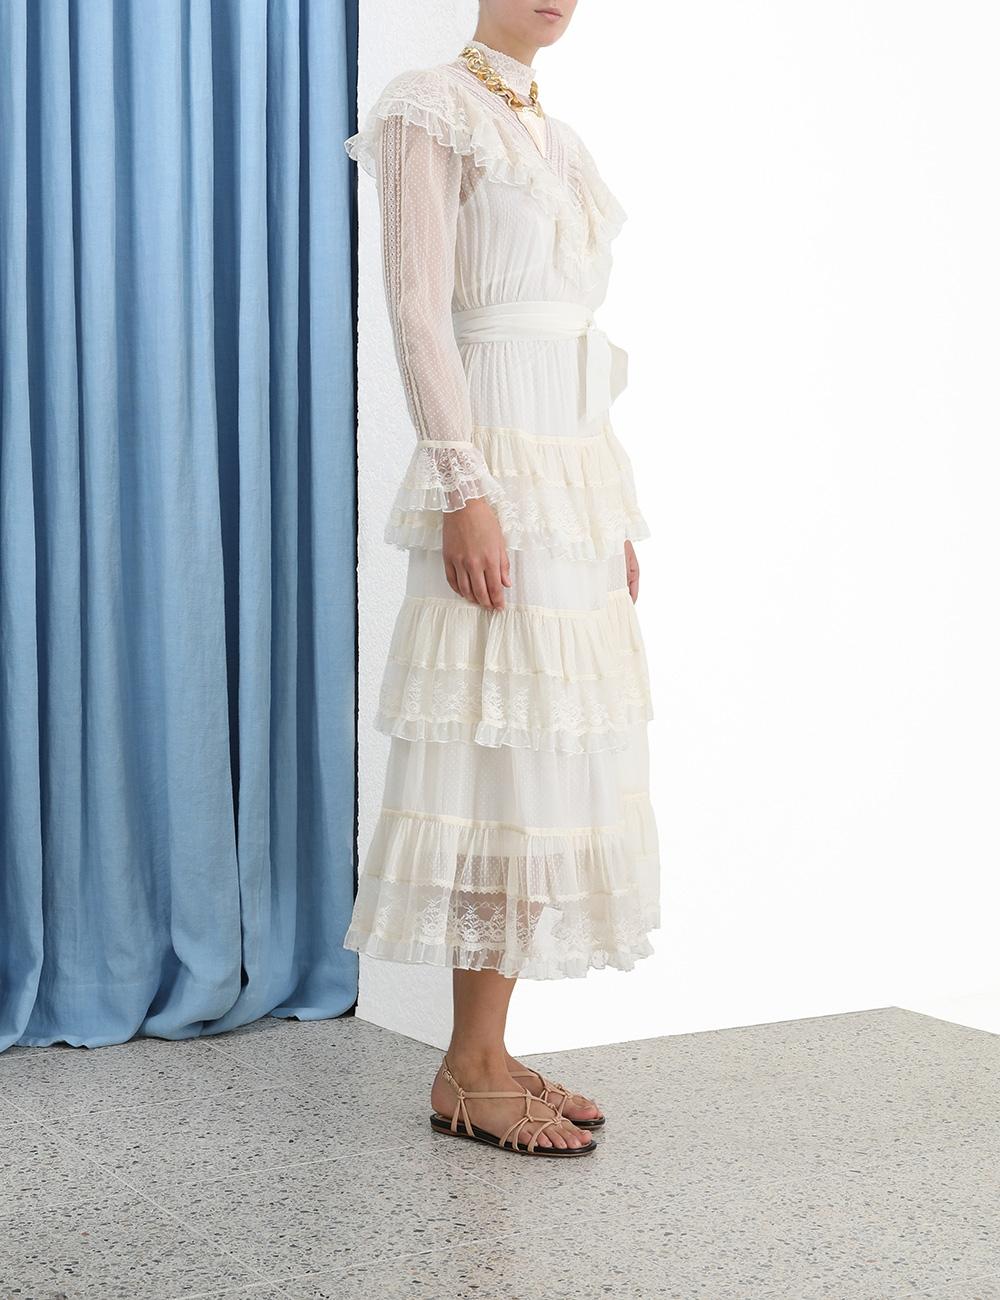 Glassy Frilled Lace Midi Dress